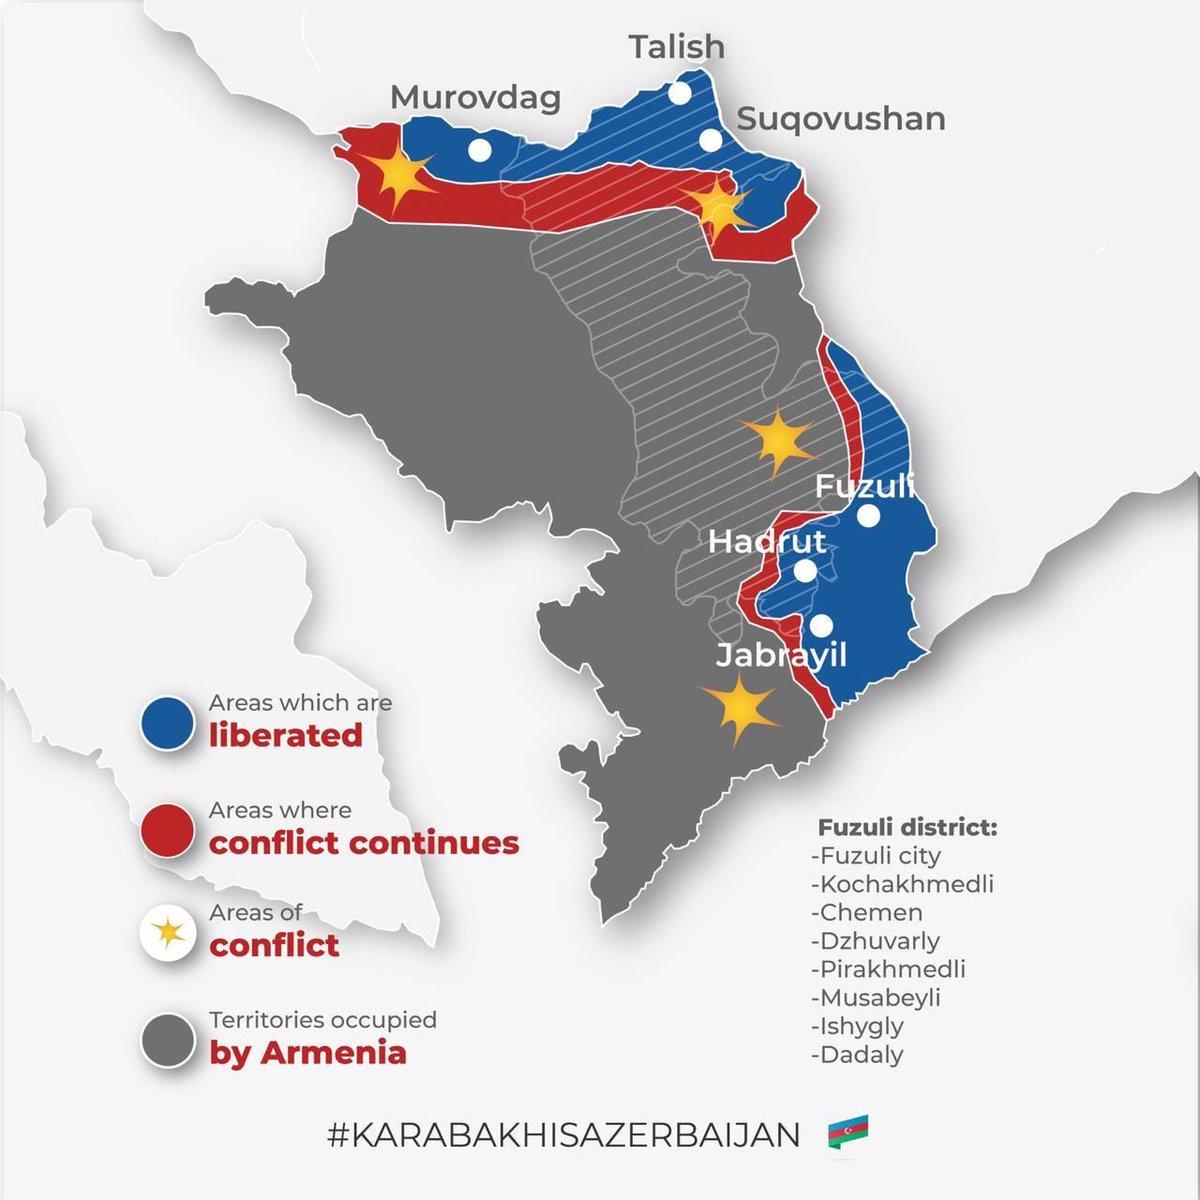 Azerbaijan Continues İts Counter-offensive Measures as a Part of the Pease Enforcement Operation. #KarabakhisAzerbaijan #GanjaCity